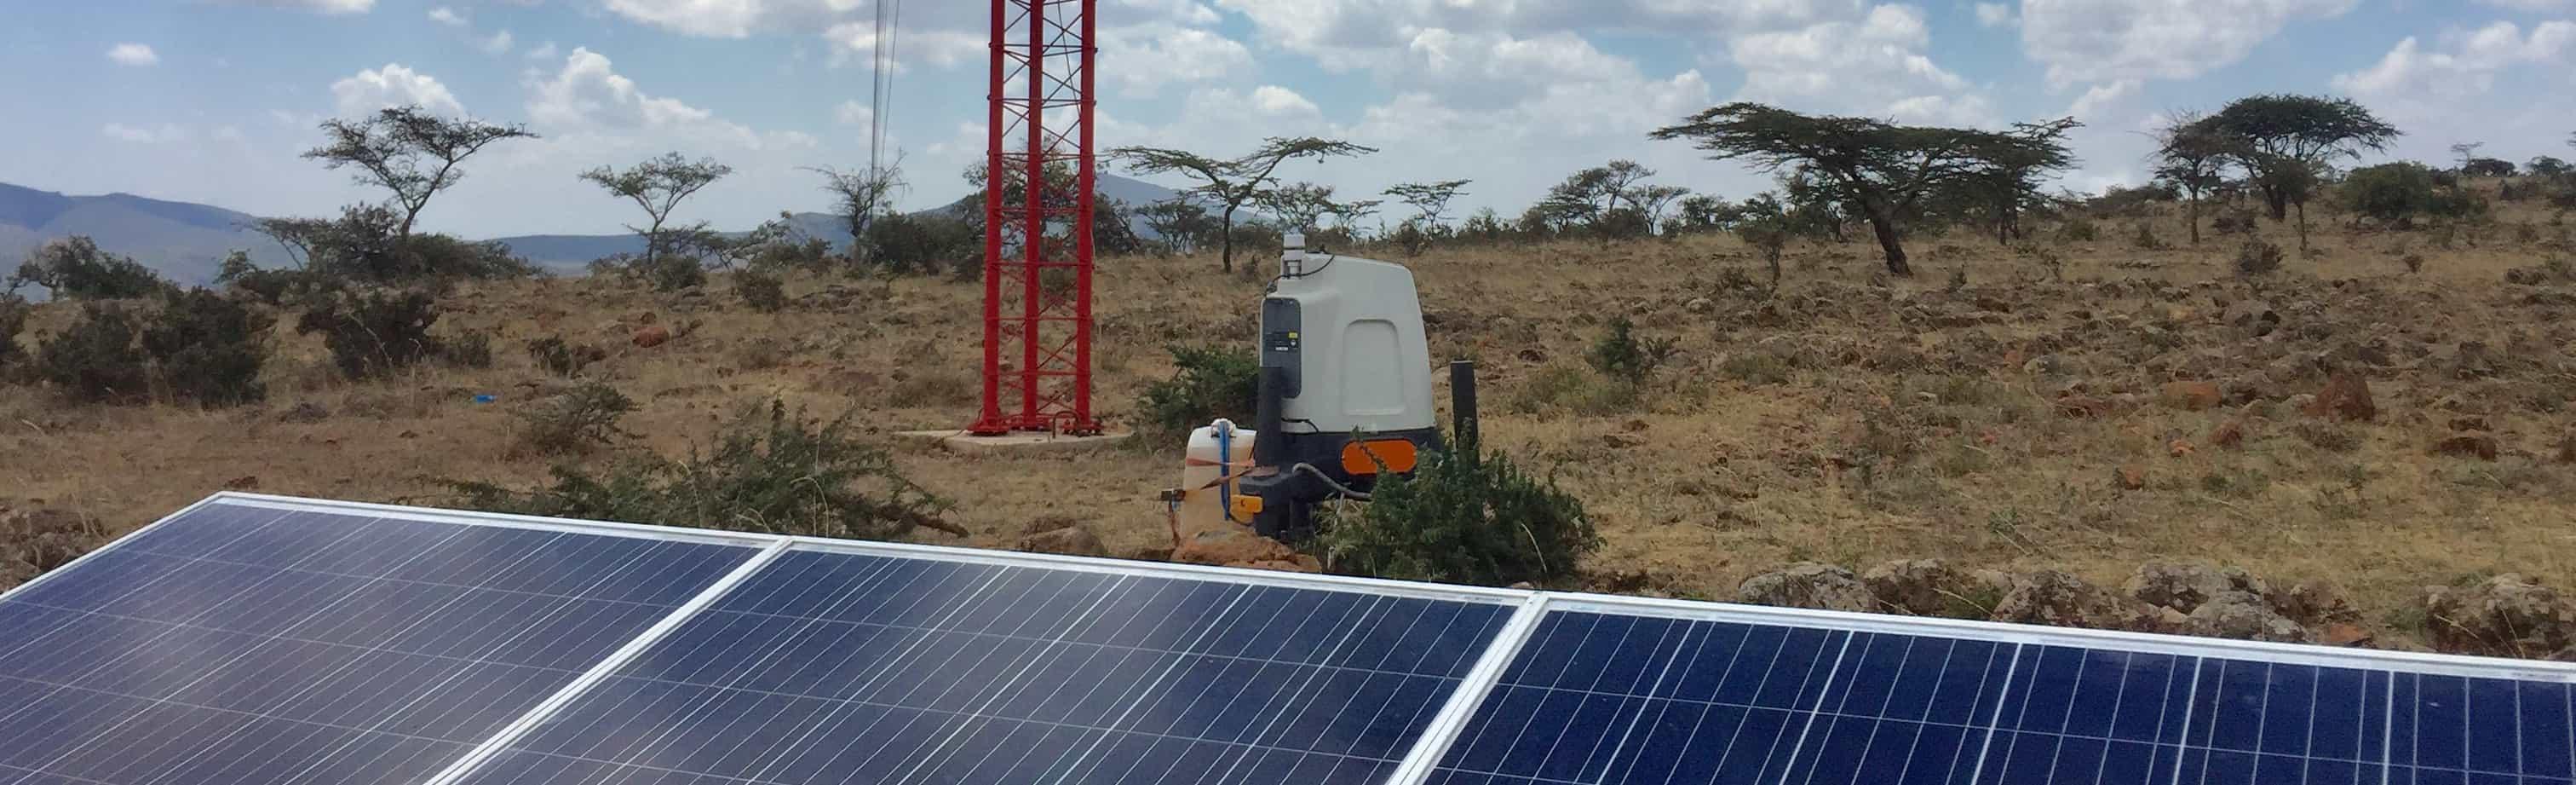 LIDAR Deployment Galetech Energy Services